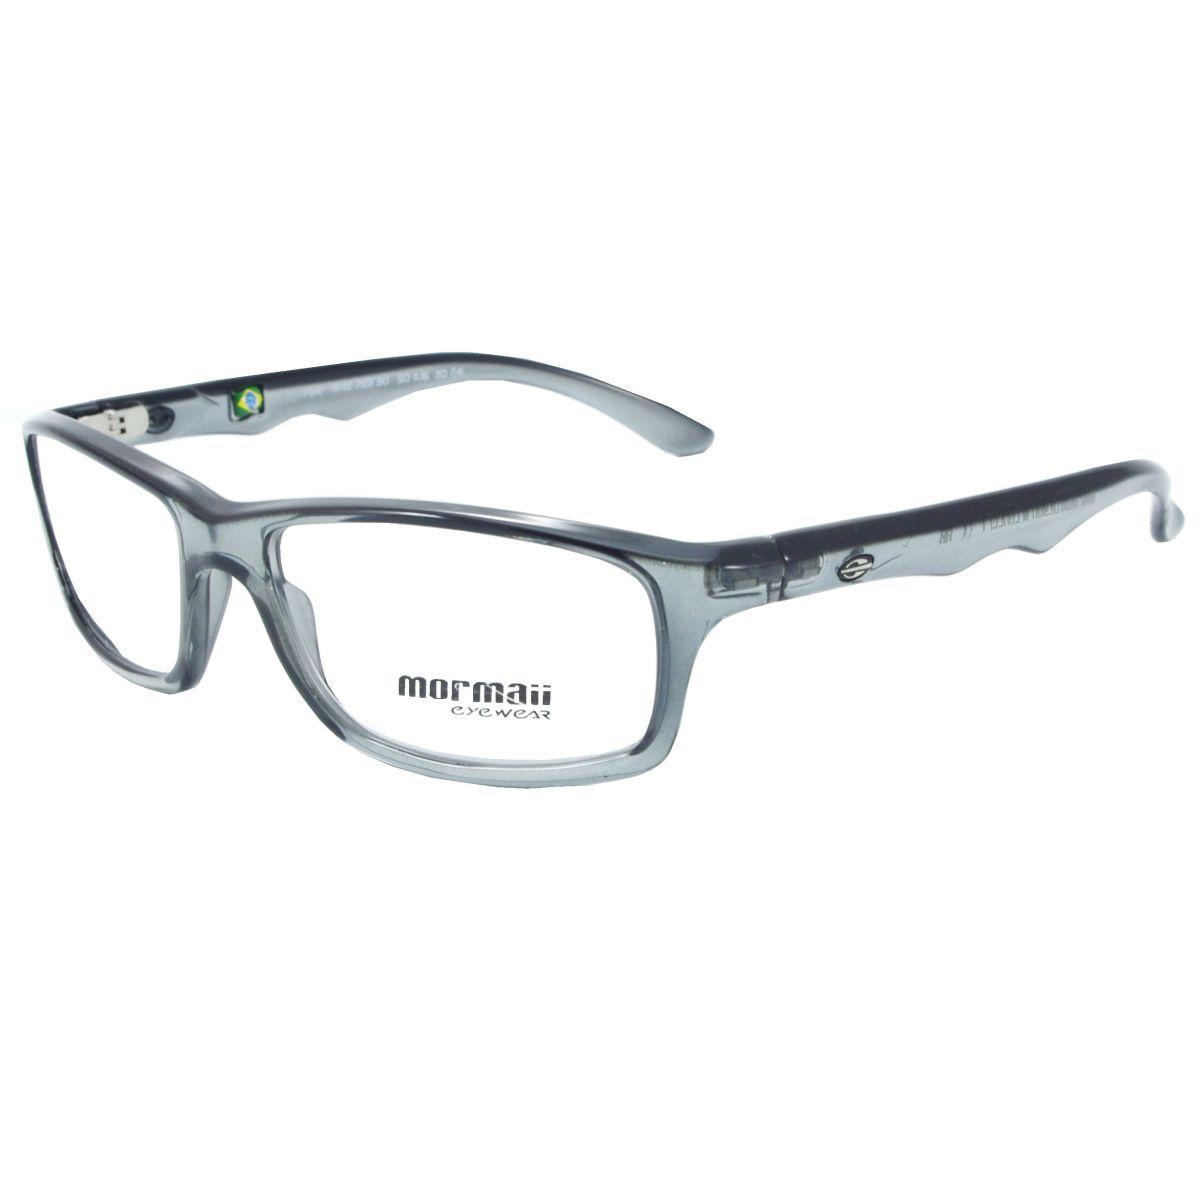 3a905cf1a5872 Óculos De Grau Mormaii Viper 1642 789 Tam.50MormaiiMormaii de ...